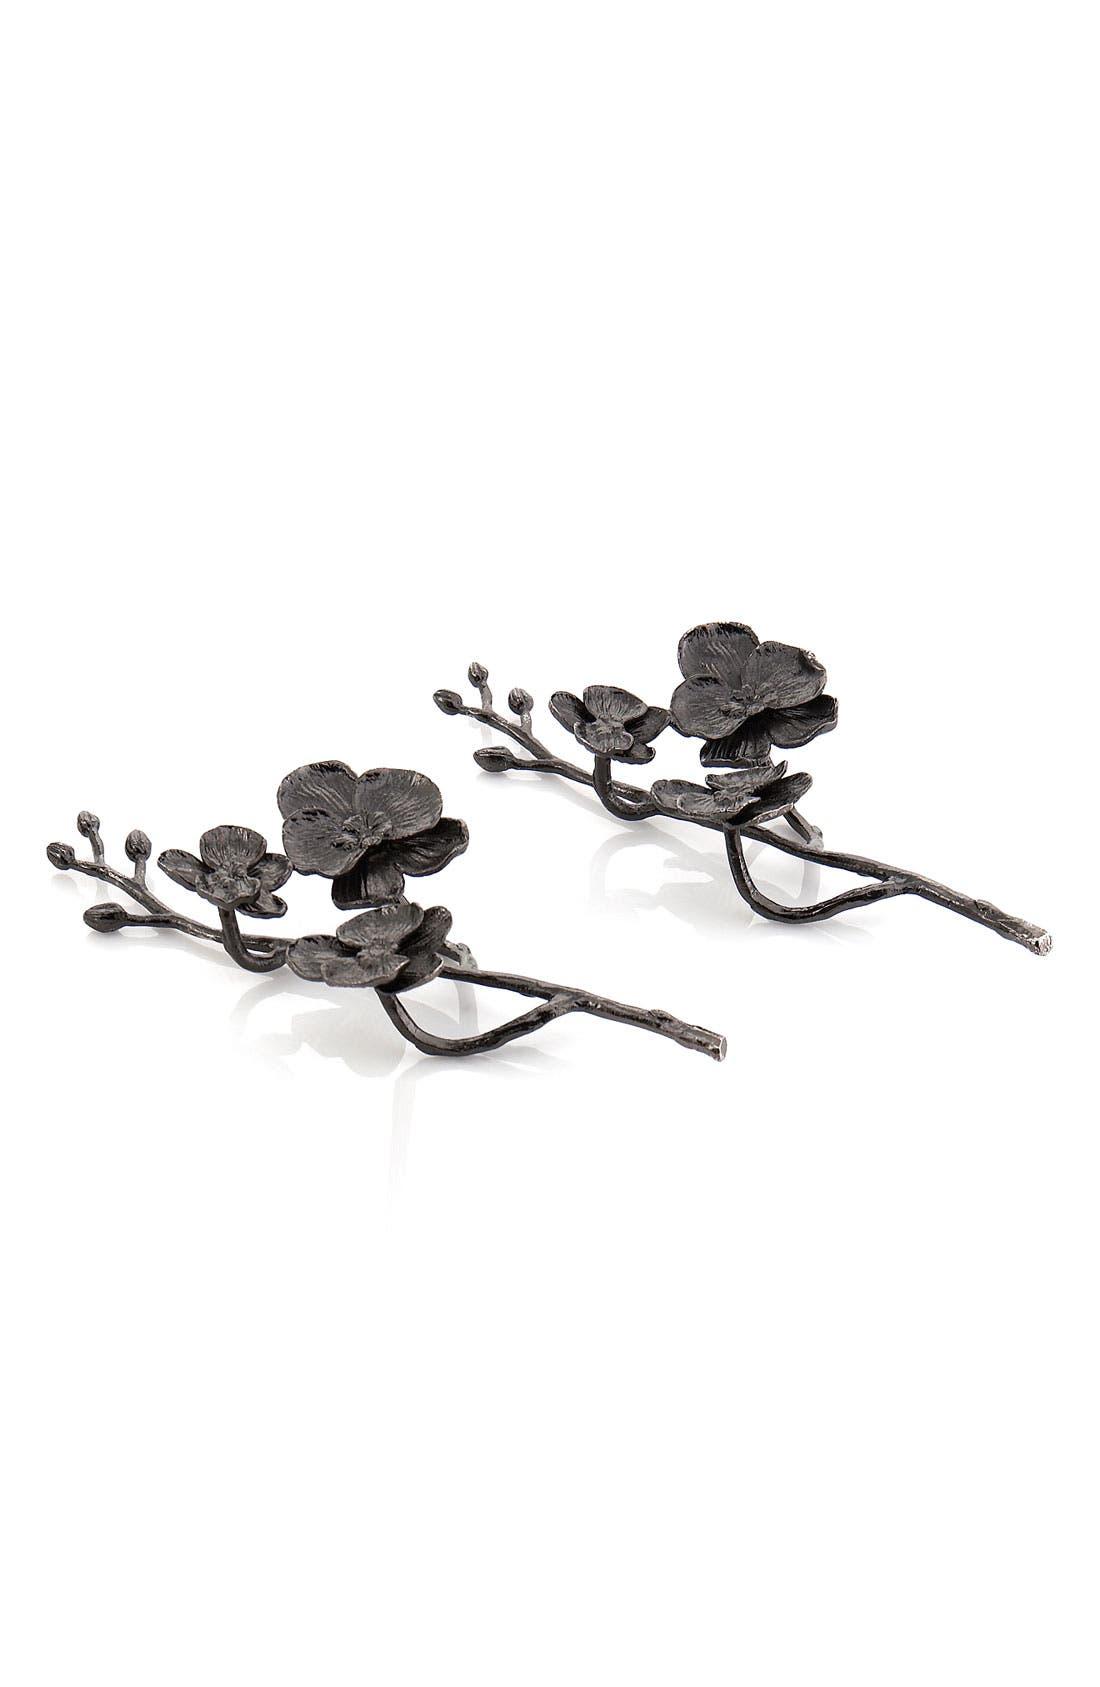 Main Image - Michael Aram 'Black Orchid' Napkin Rings (Set of 2)